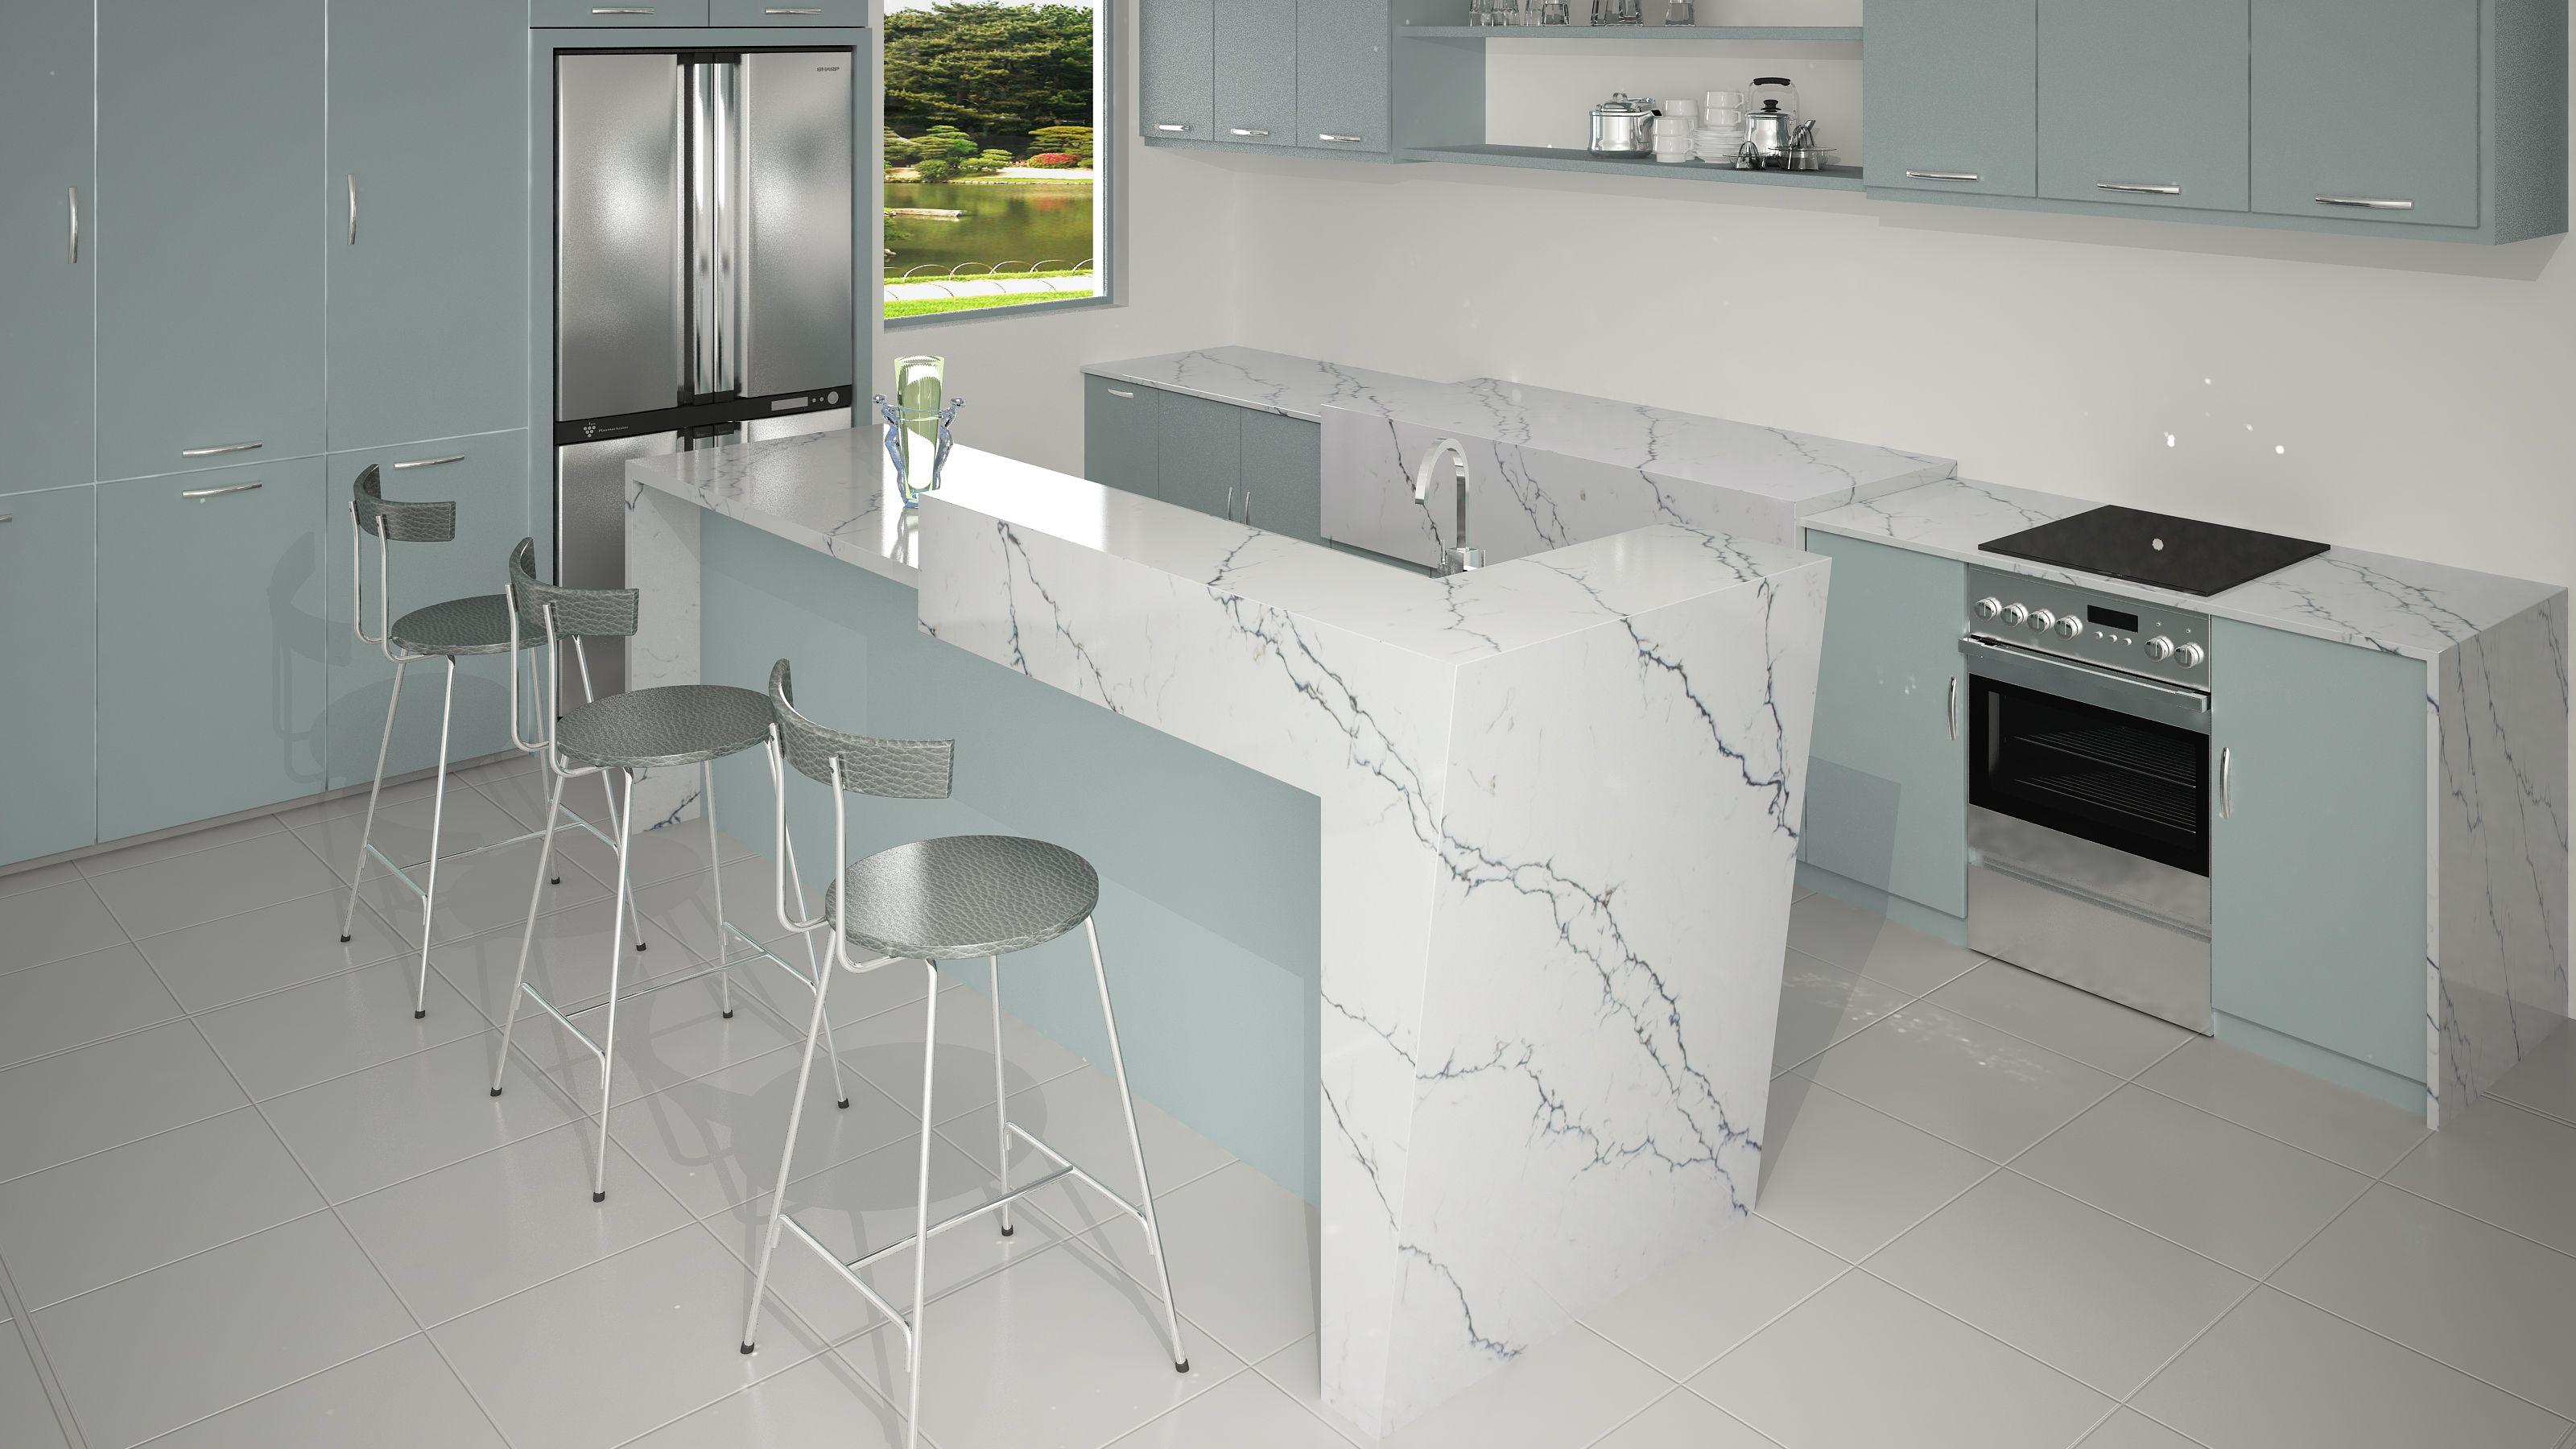 BQ8660   Vicostone Quartz Surfaces   Pinterest   Countertop and Kitchens